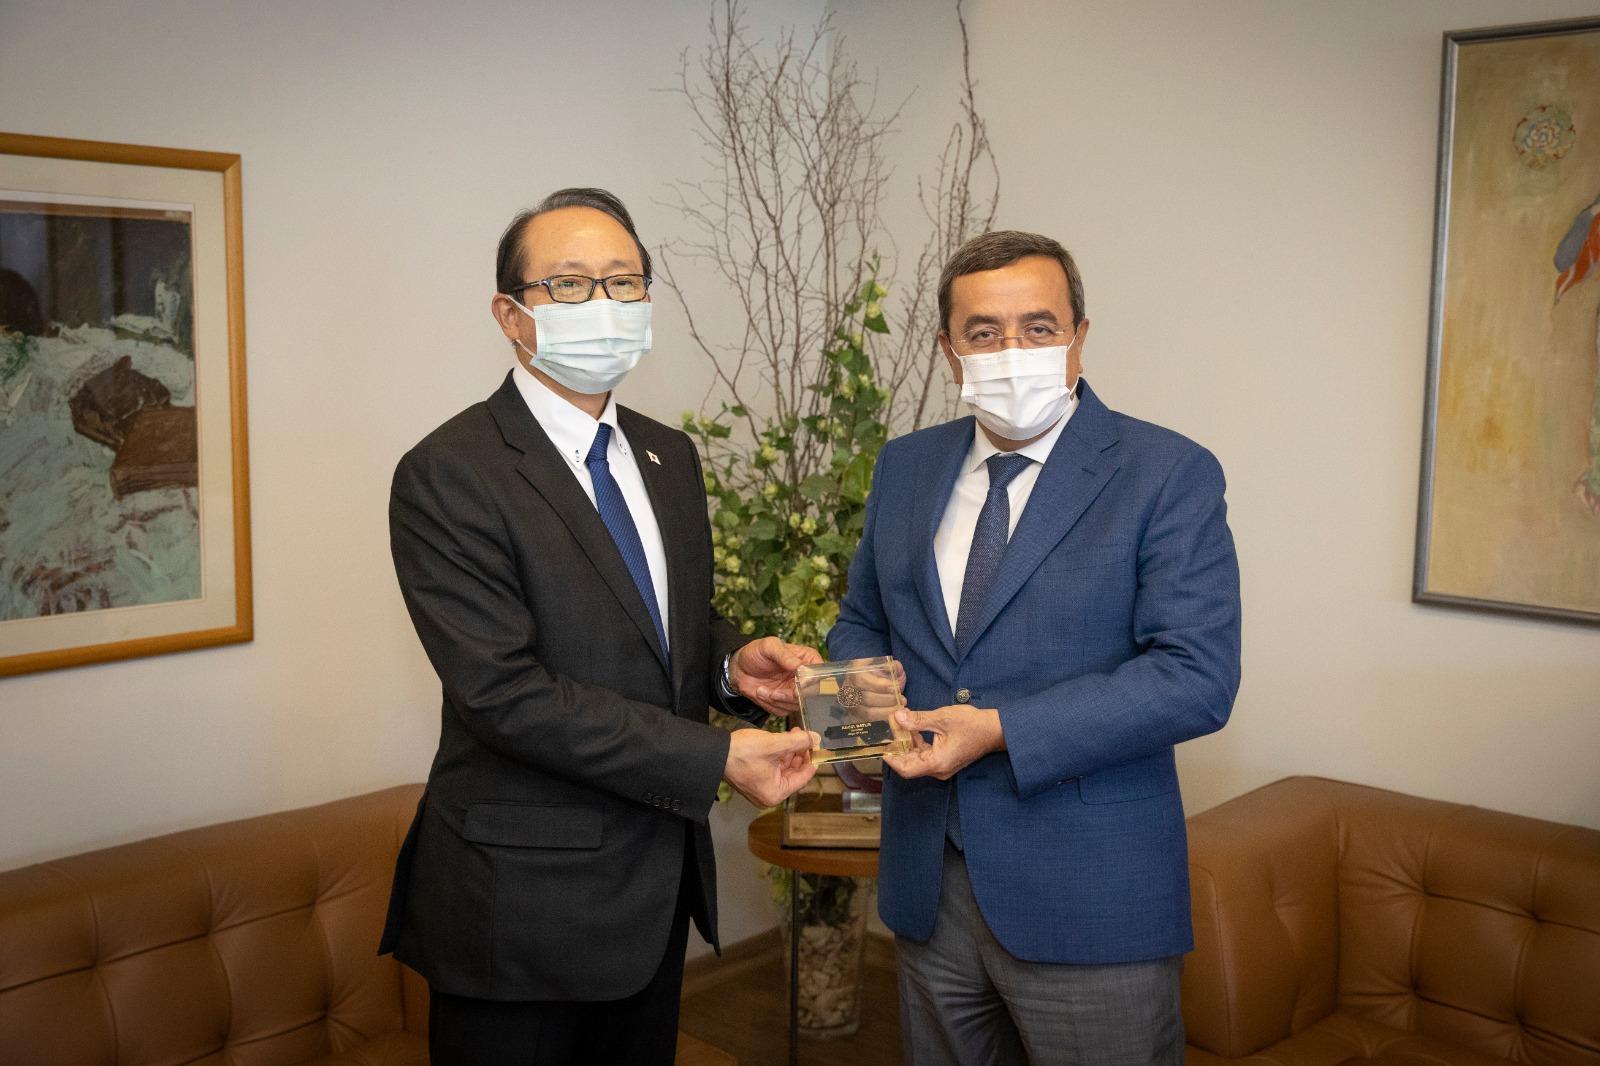 Başkan Batur, Japonya İstanbul Başkonsolosu Hisao Nishimaki'yi konuk etti (5)